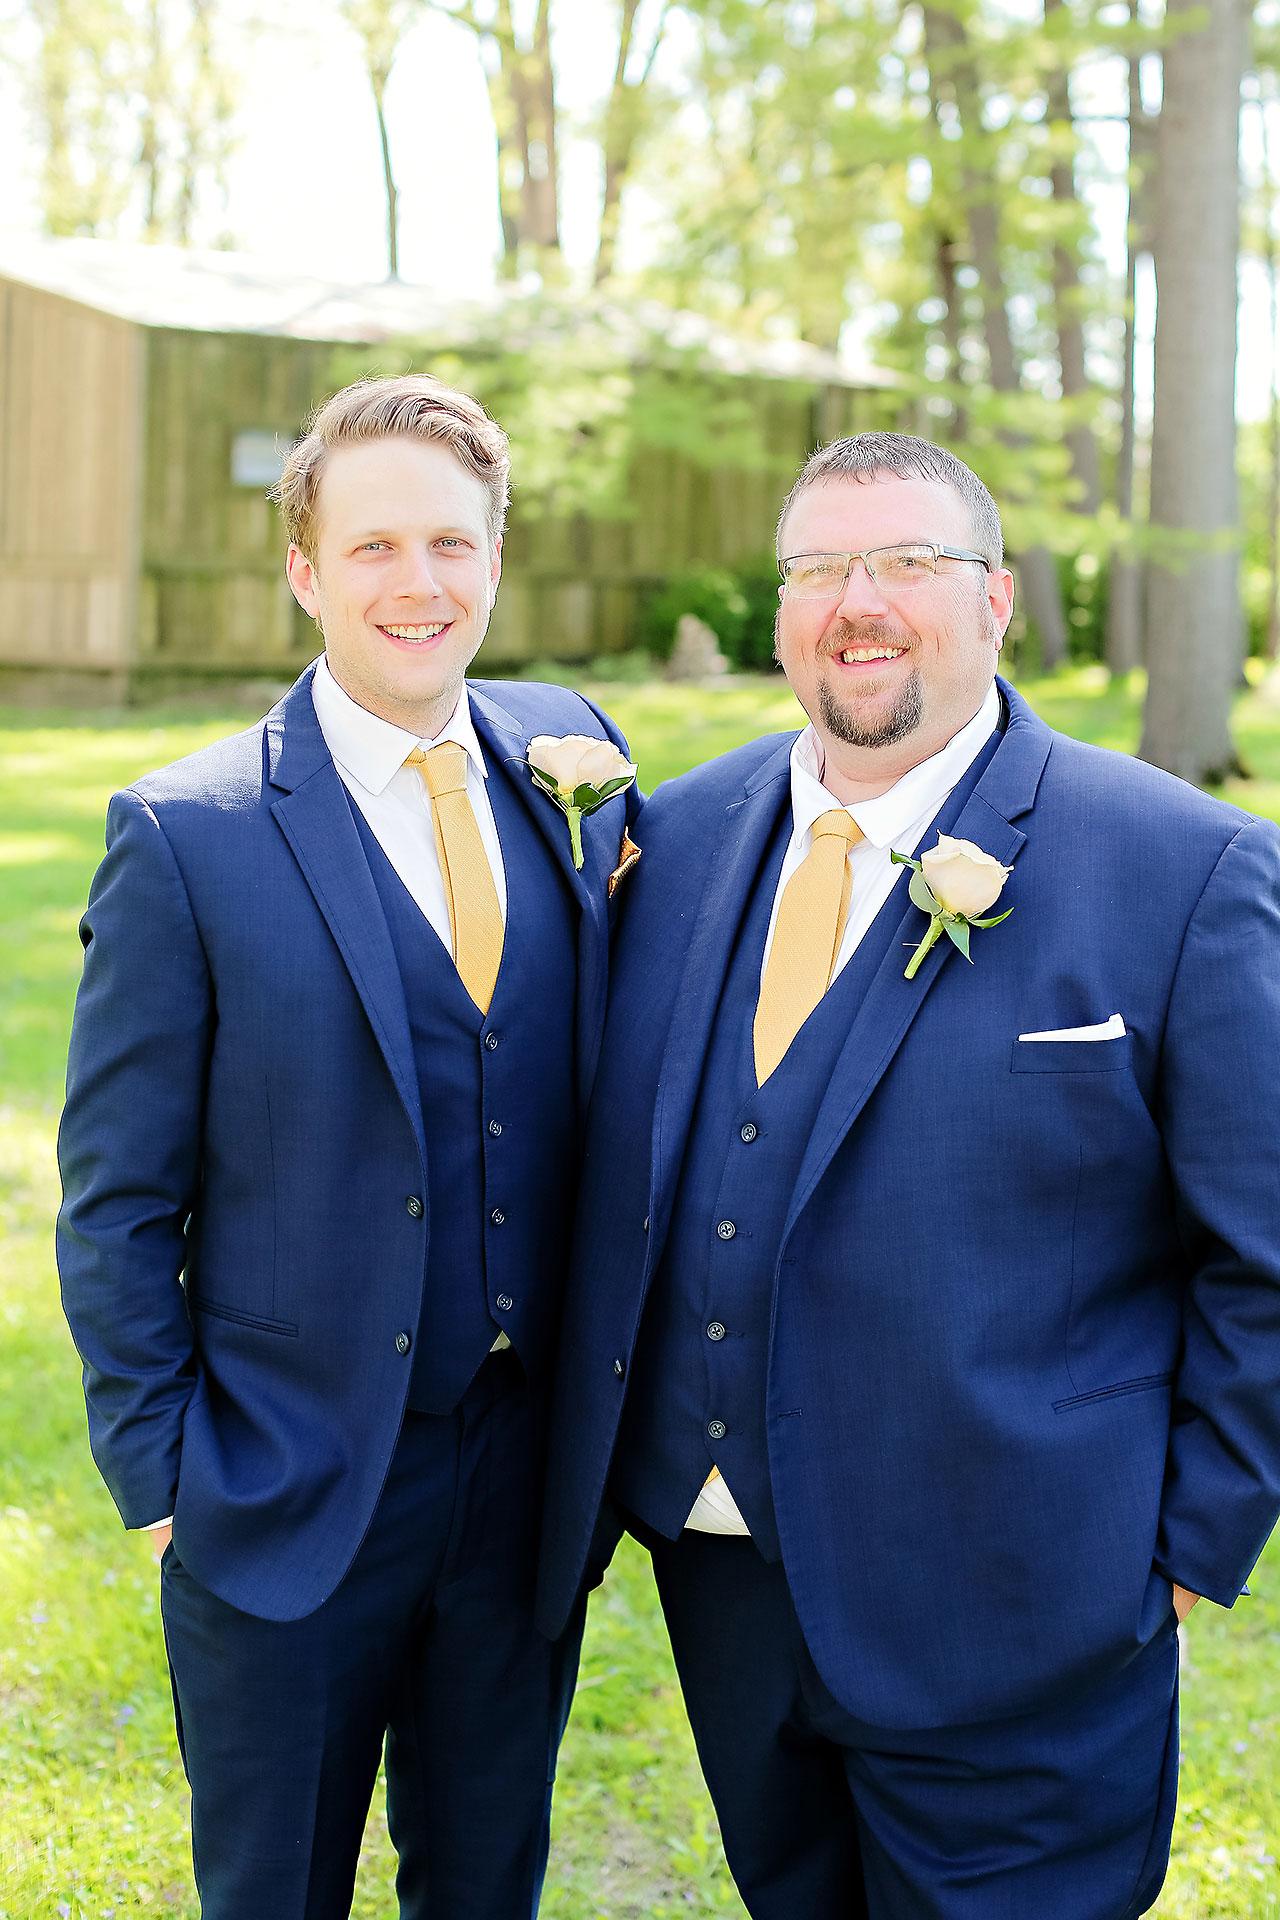 Nadia Parker Black Iris Estate Carmel Indiana Wedding May 2021 116